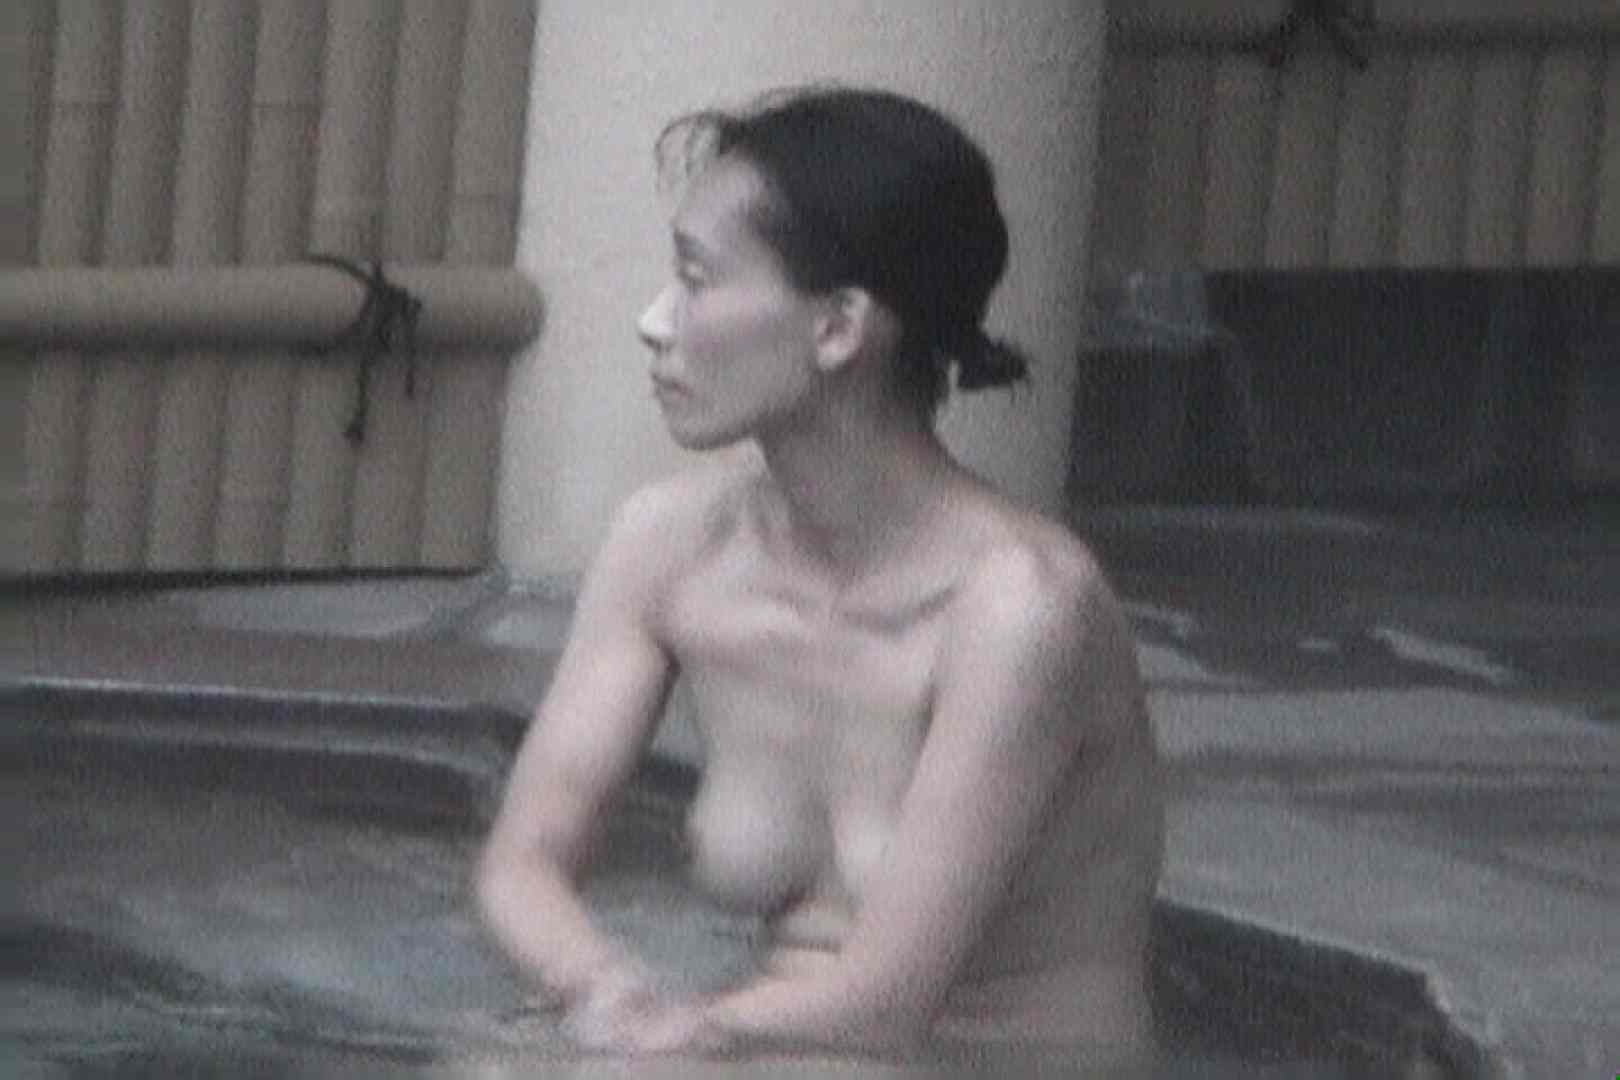 Aquaな露天風呂Vol.557 露天風呂編  100PIX 8